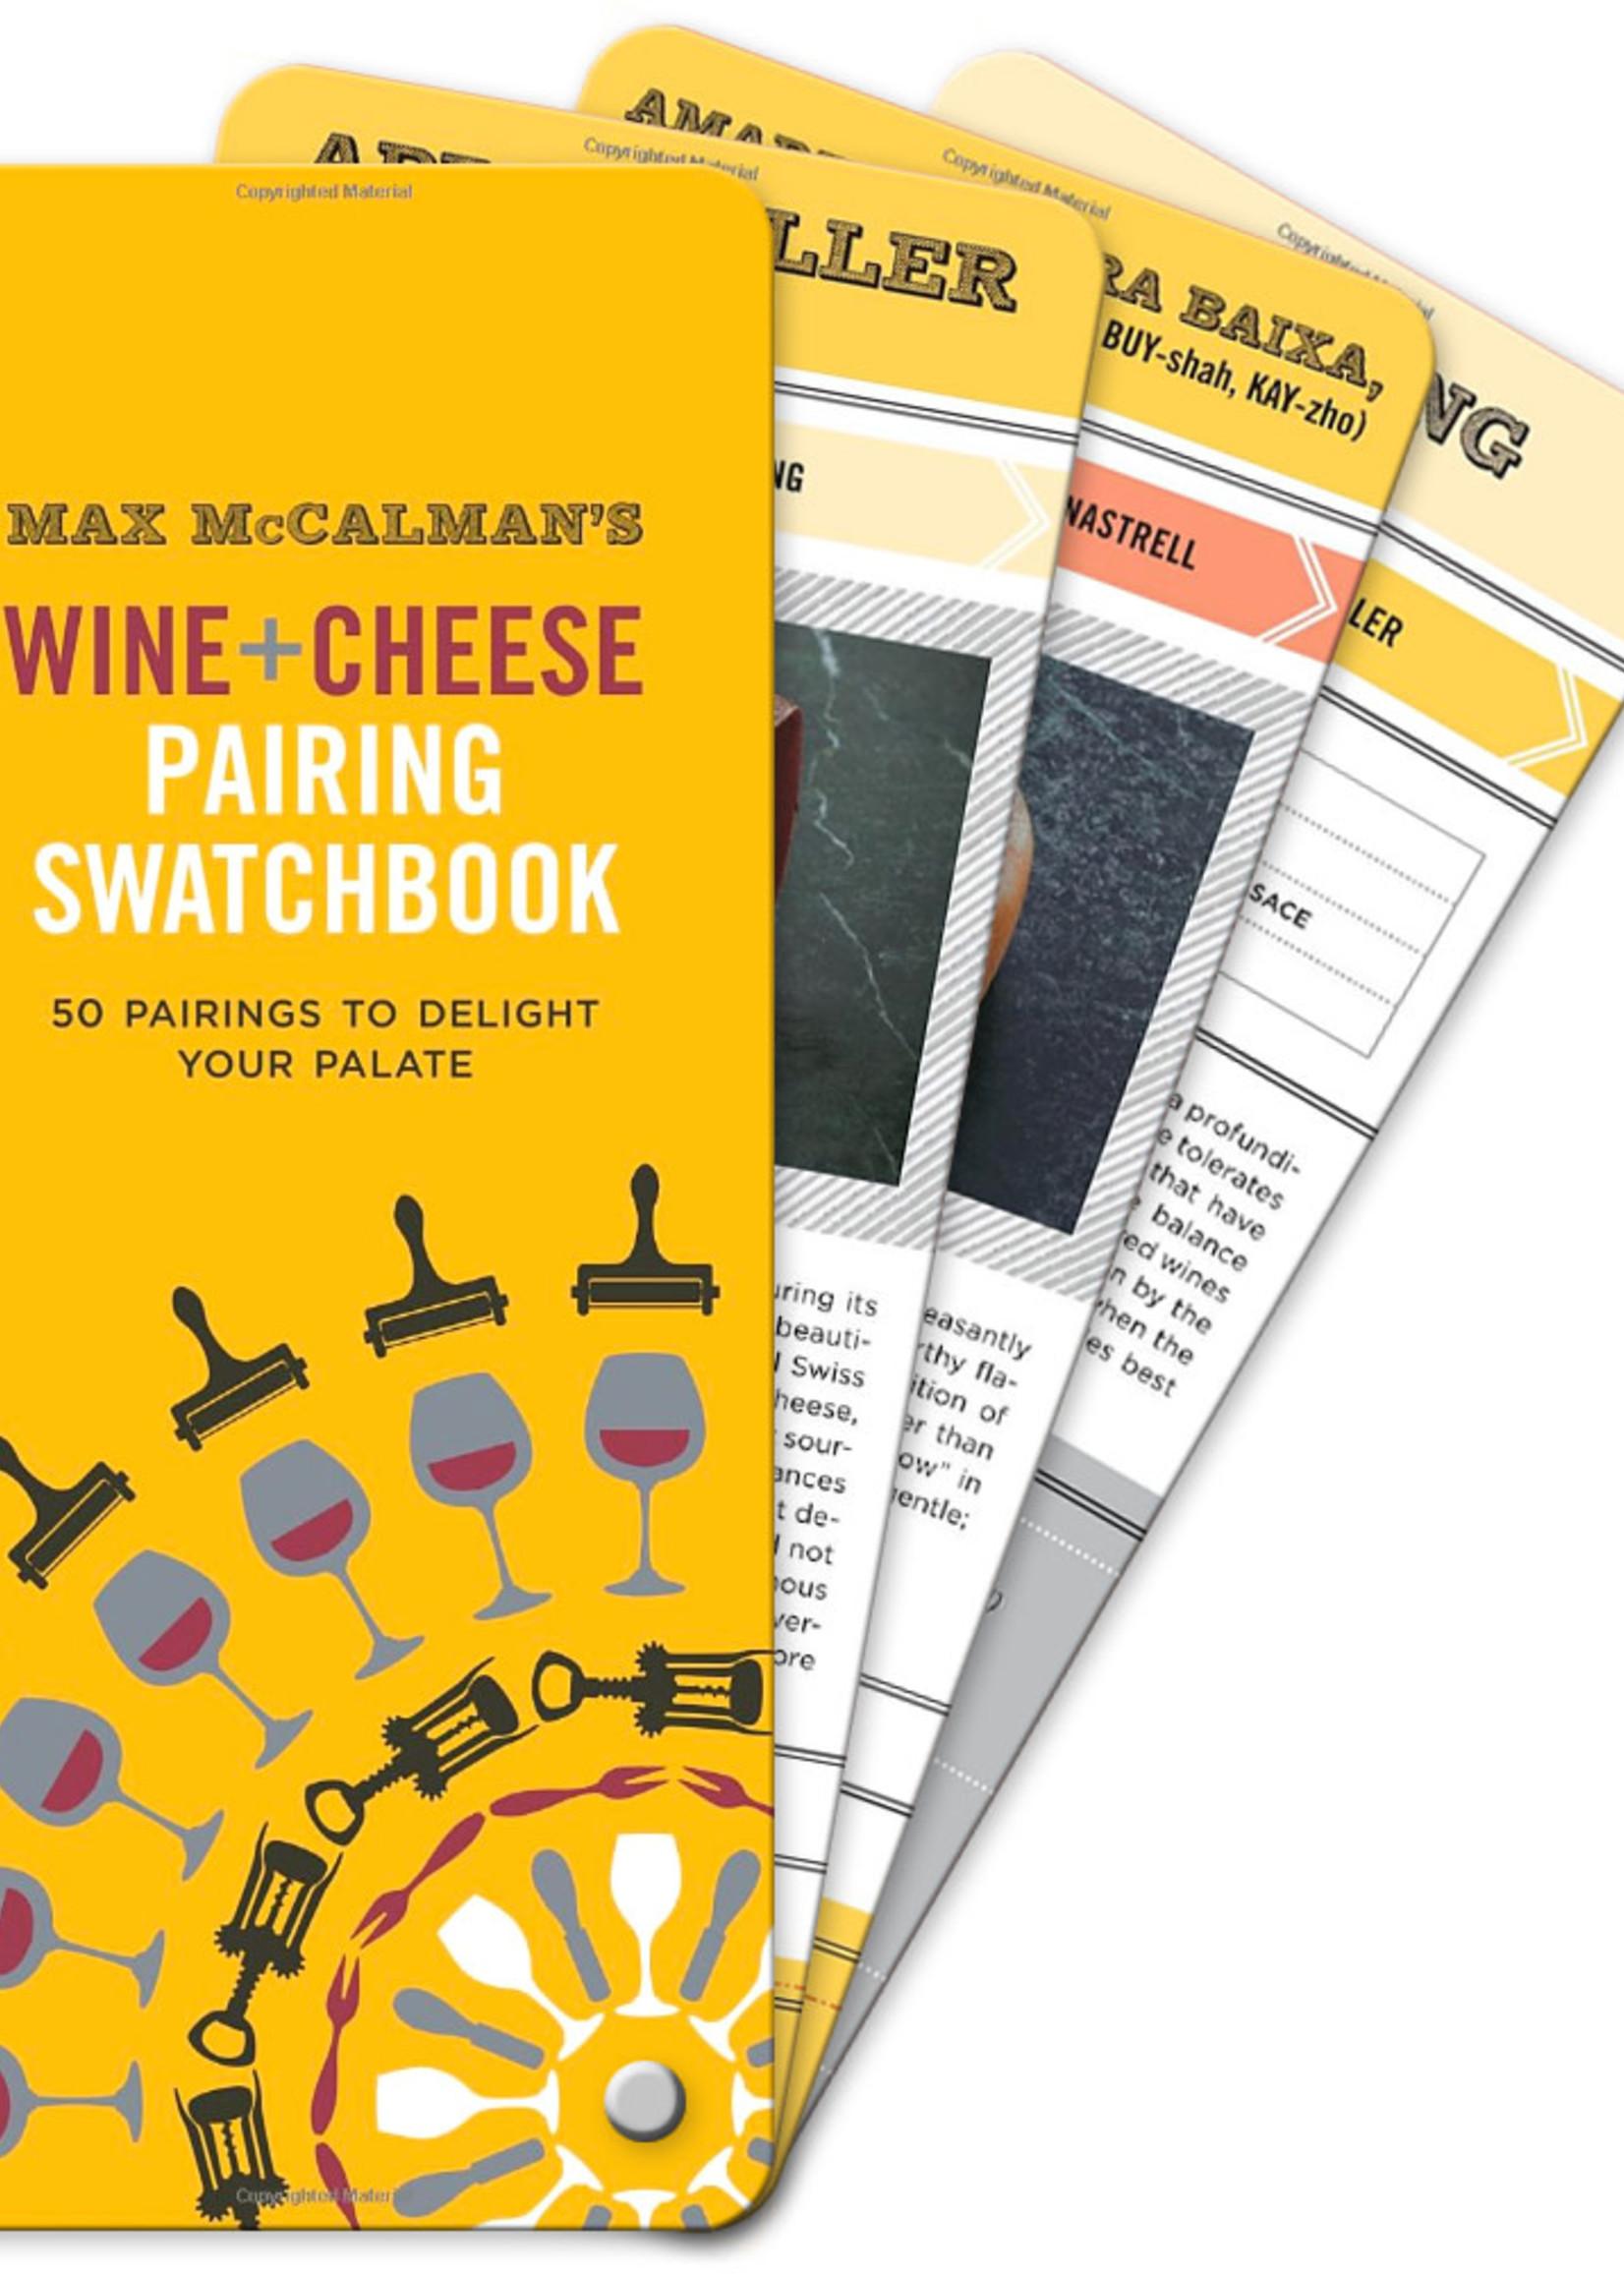 Wine + Cheese Pairing Swatchbook